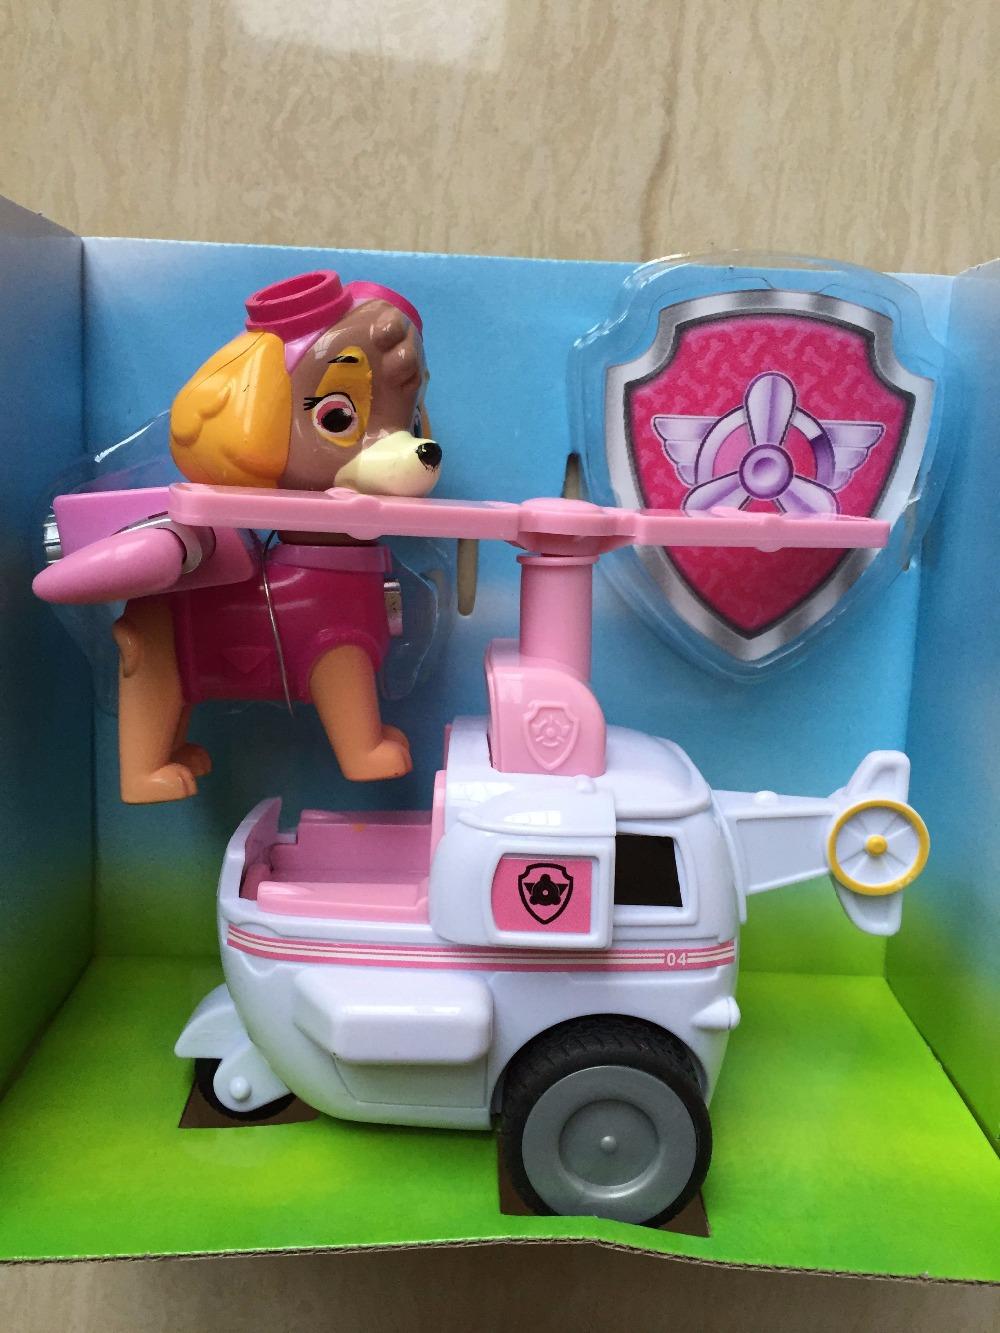 7 Kinds Of Anime Model Kids Action Figure Light Patrulla Canina Toys,Kids Toys Anime Dog Vehicle Juguetes Patrol Toys(China (Mainland))